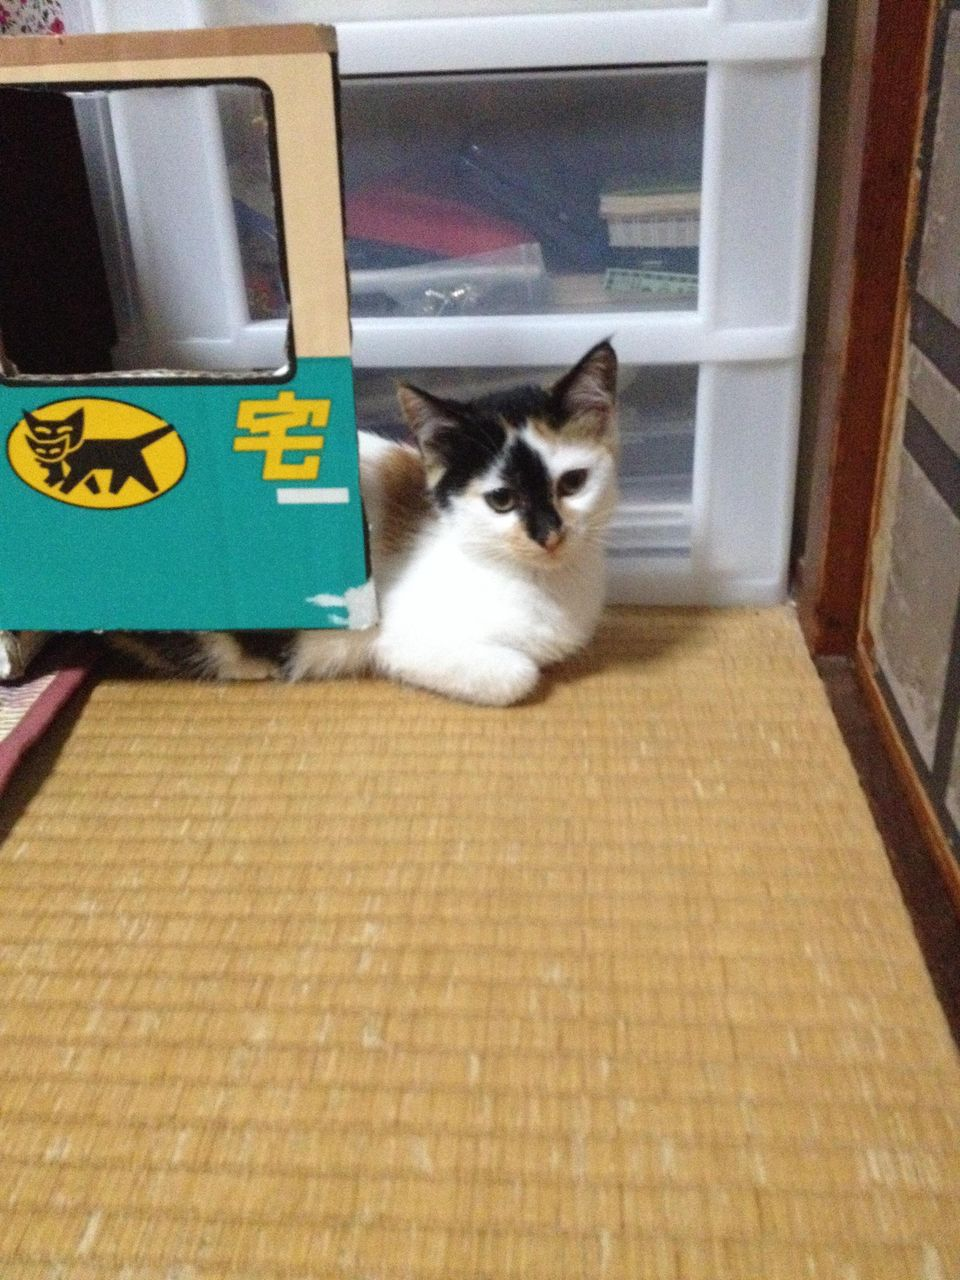 http://livedoor.blogimg.jp/akan2ch/imgs/6/c/6c24df66.jpg